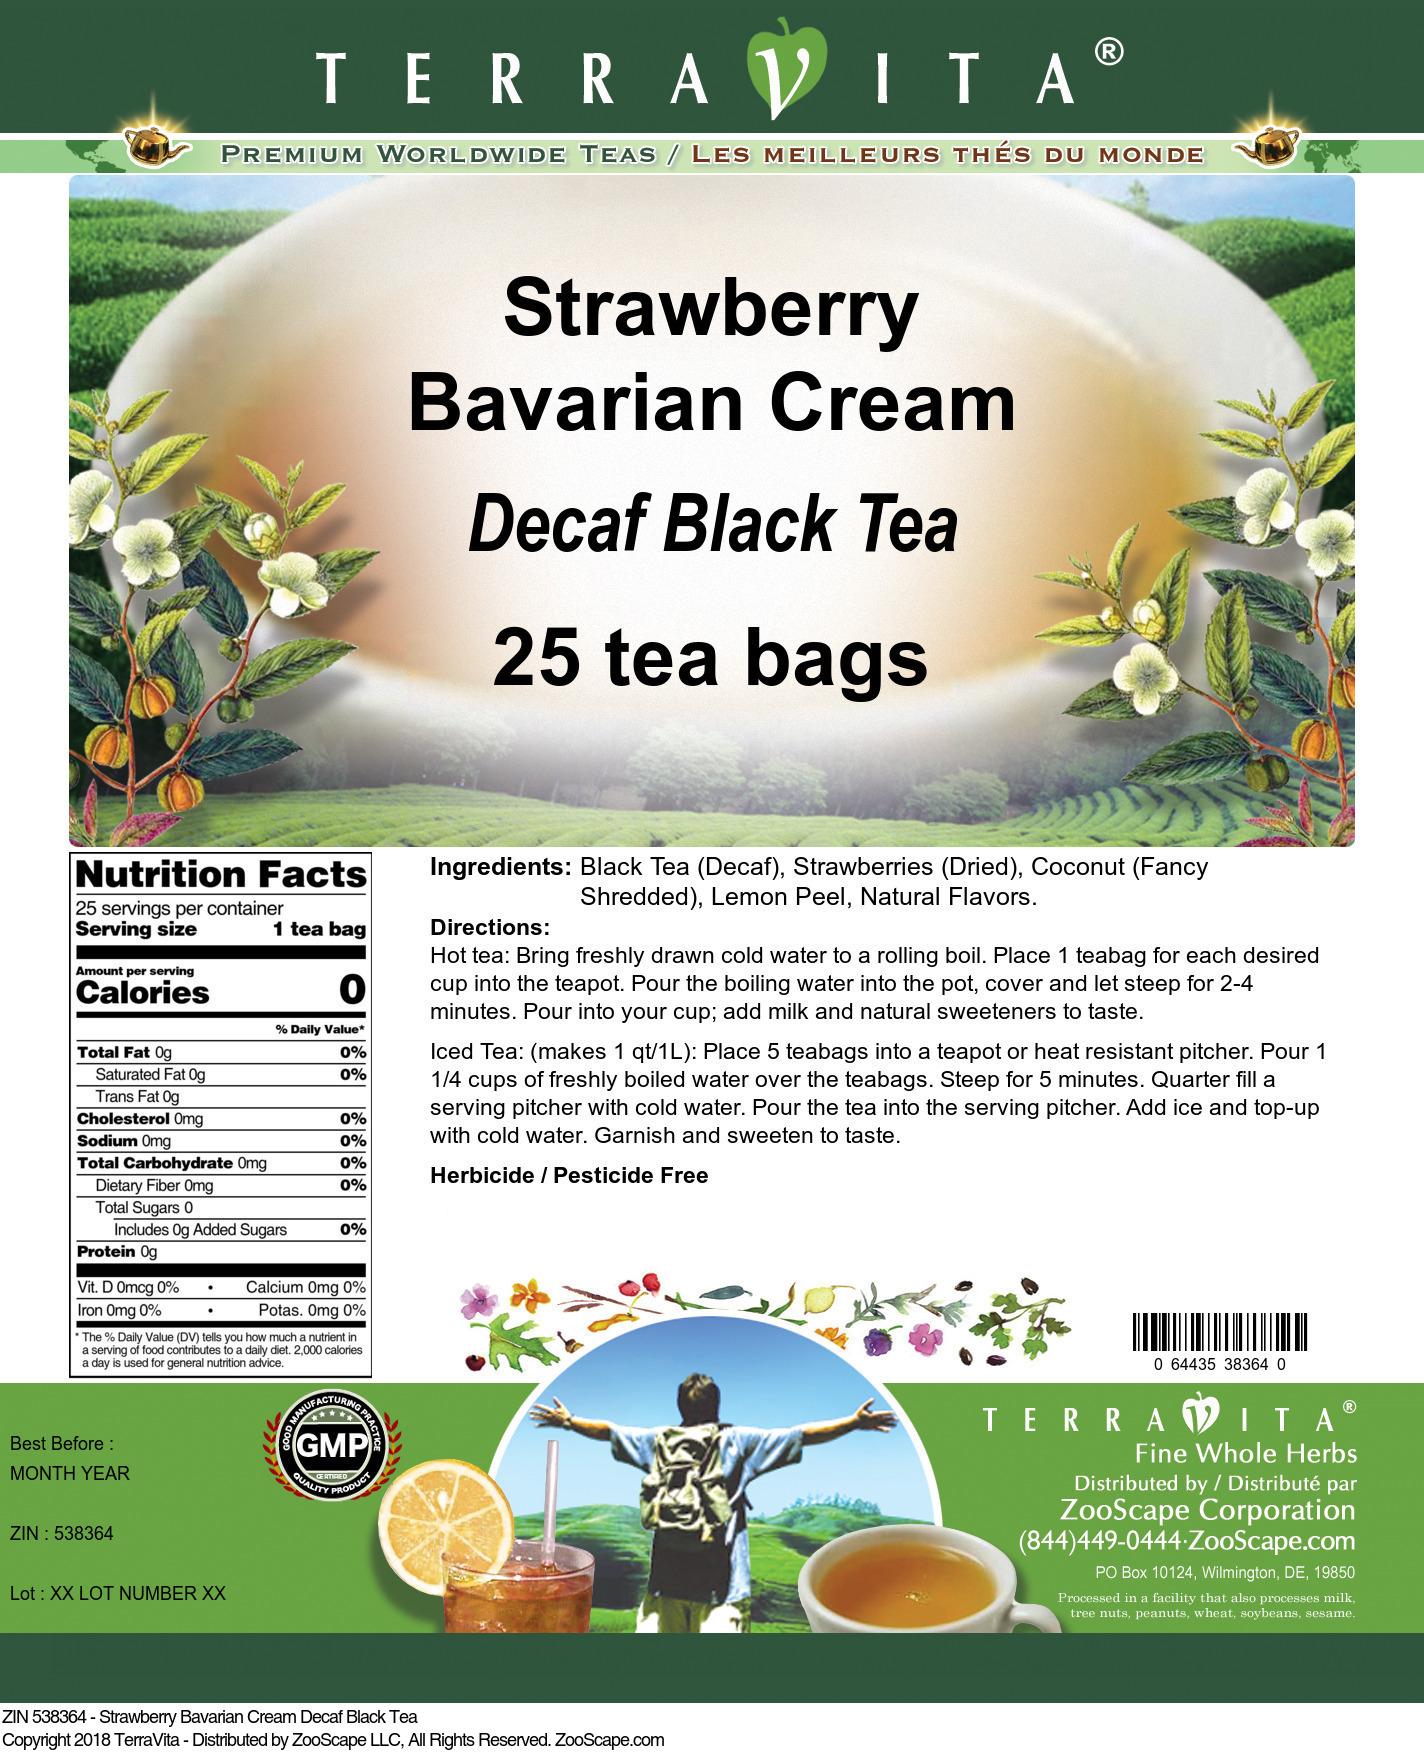 Strawberry Bavarian Cream Decaf Black Tea